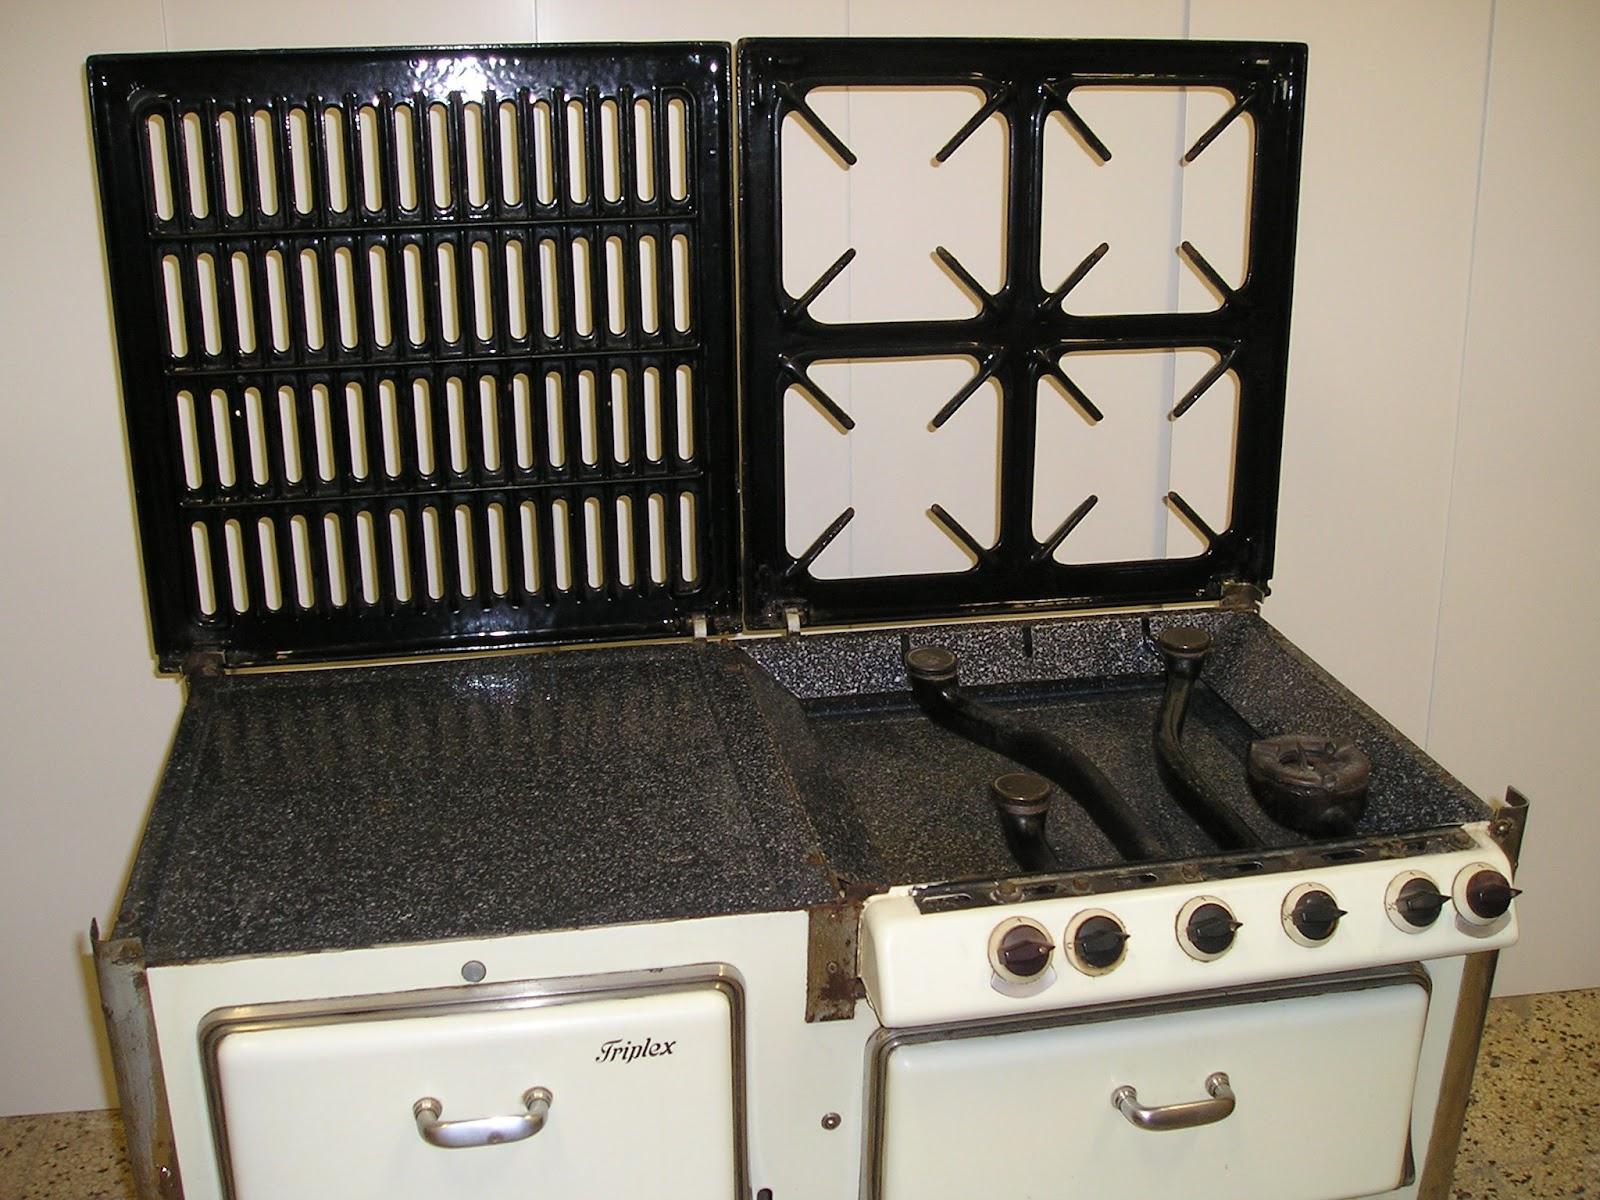 Cucina Anni 30 : L officina dell antico cucina a gas triplex anni